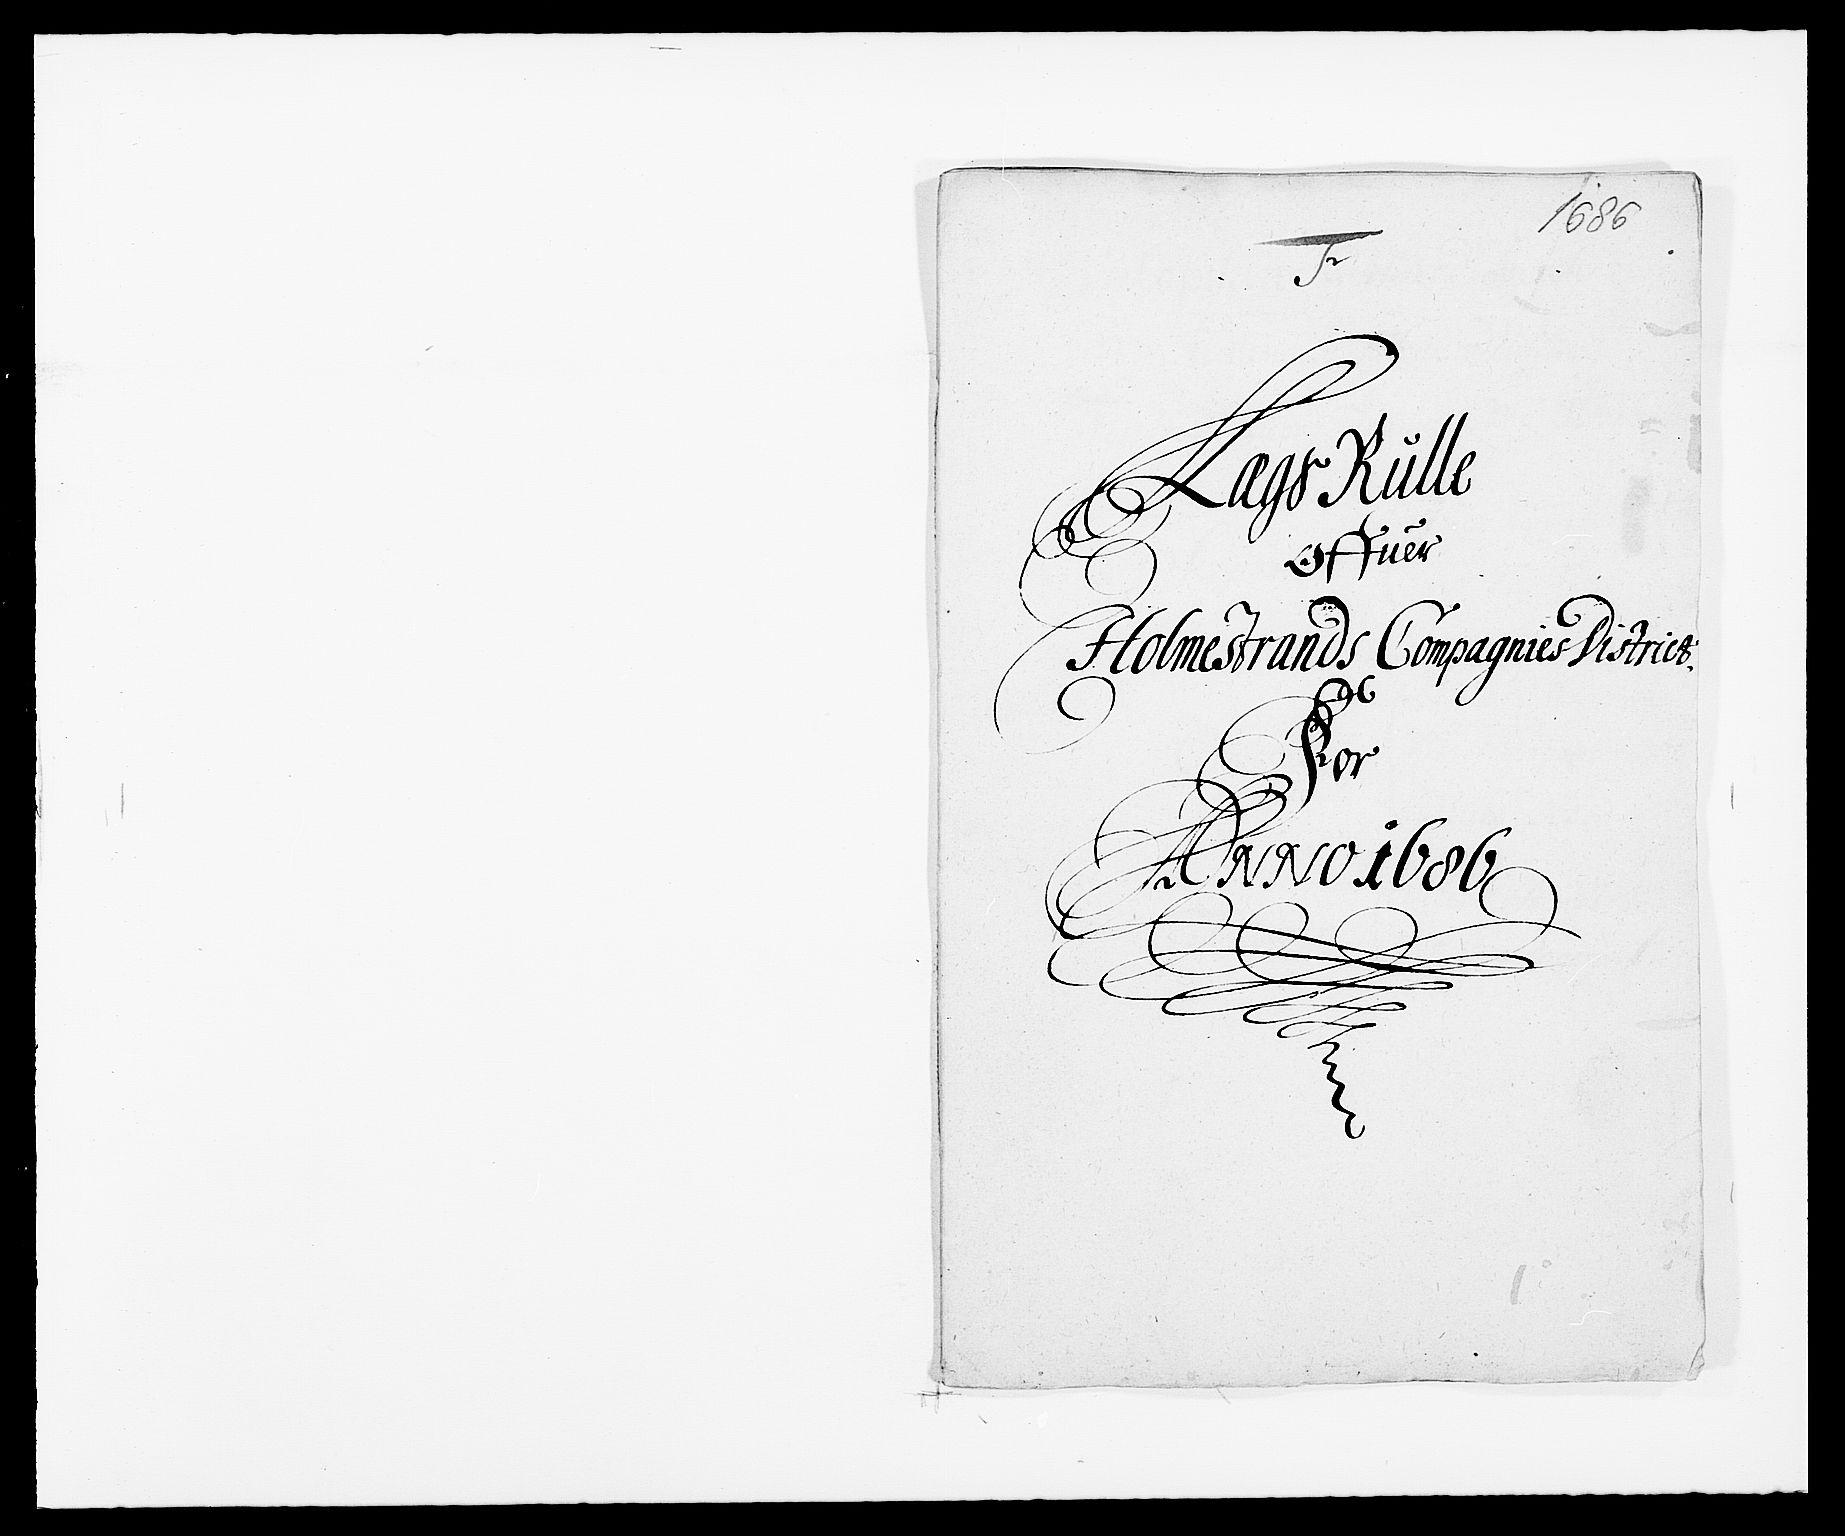 RA, Rentekammeret inntil 1814, Reviderte regnskaper, Fogderegnskap, R32/L1857: Fogderegnskap Jarlsberg grevskap, 1686-1690, s. 278